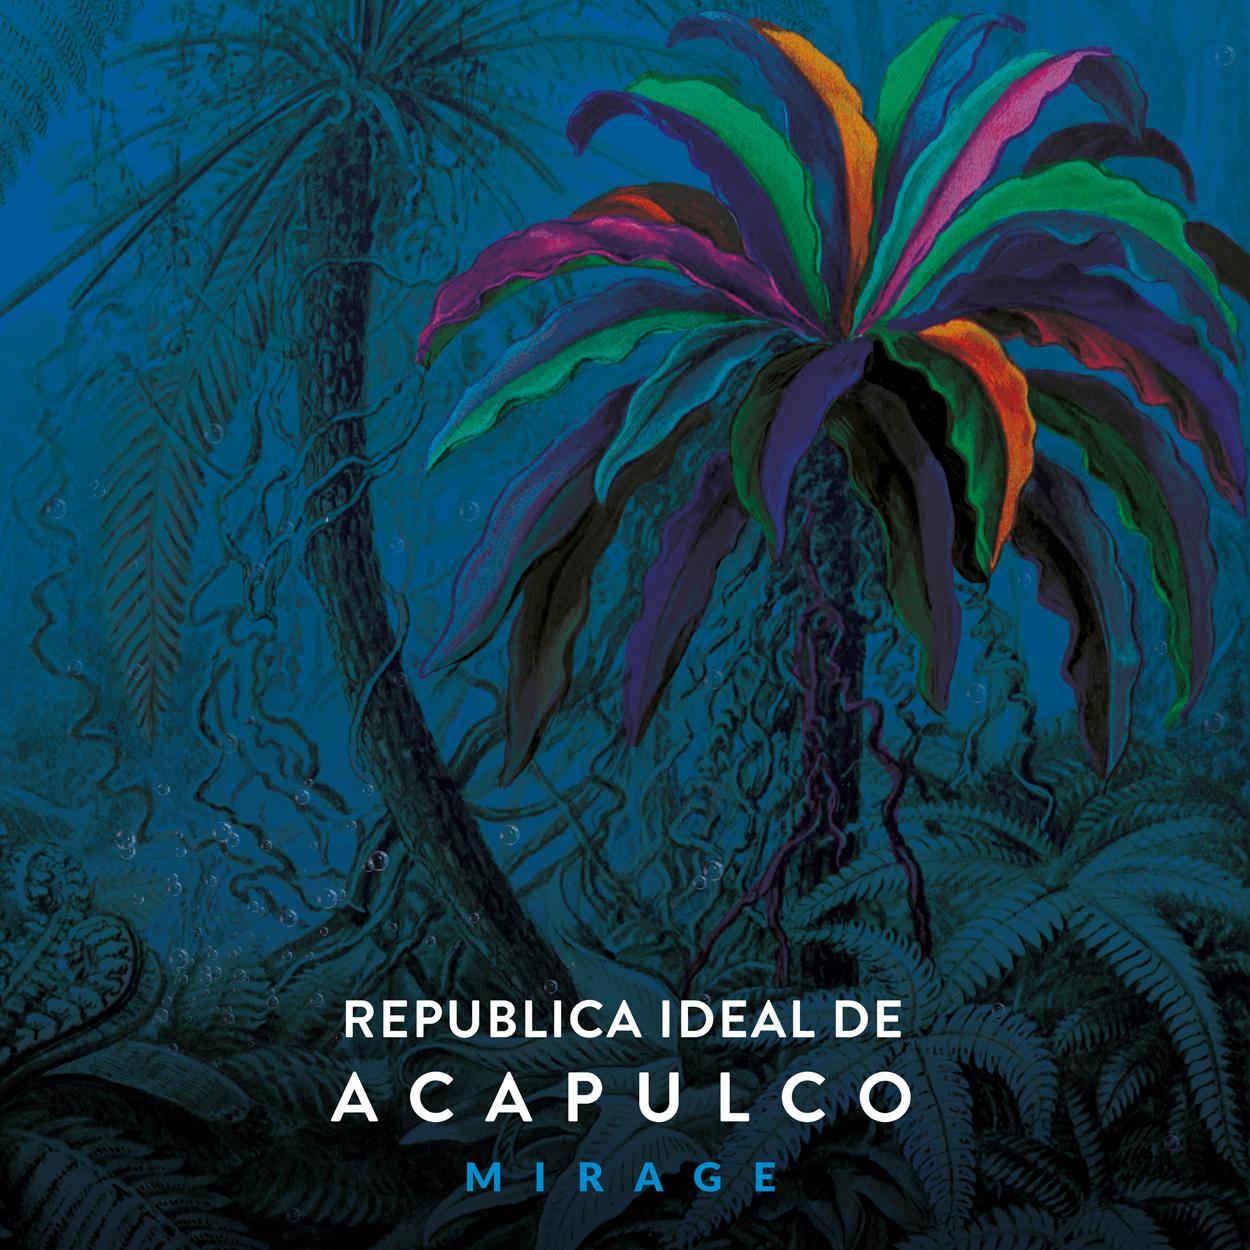 Republica Ideal de Acapulco, Mirage